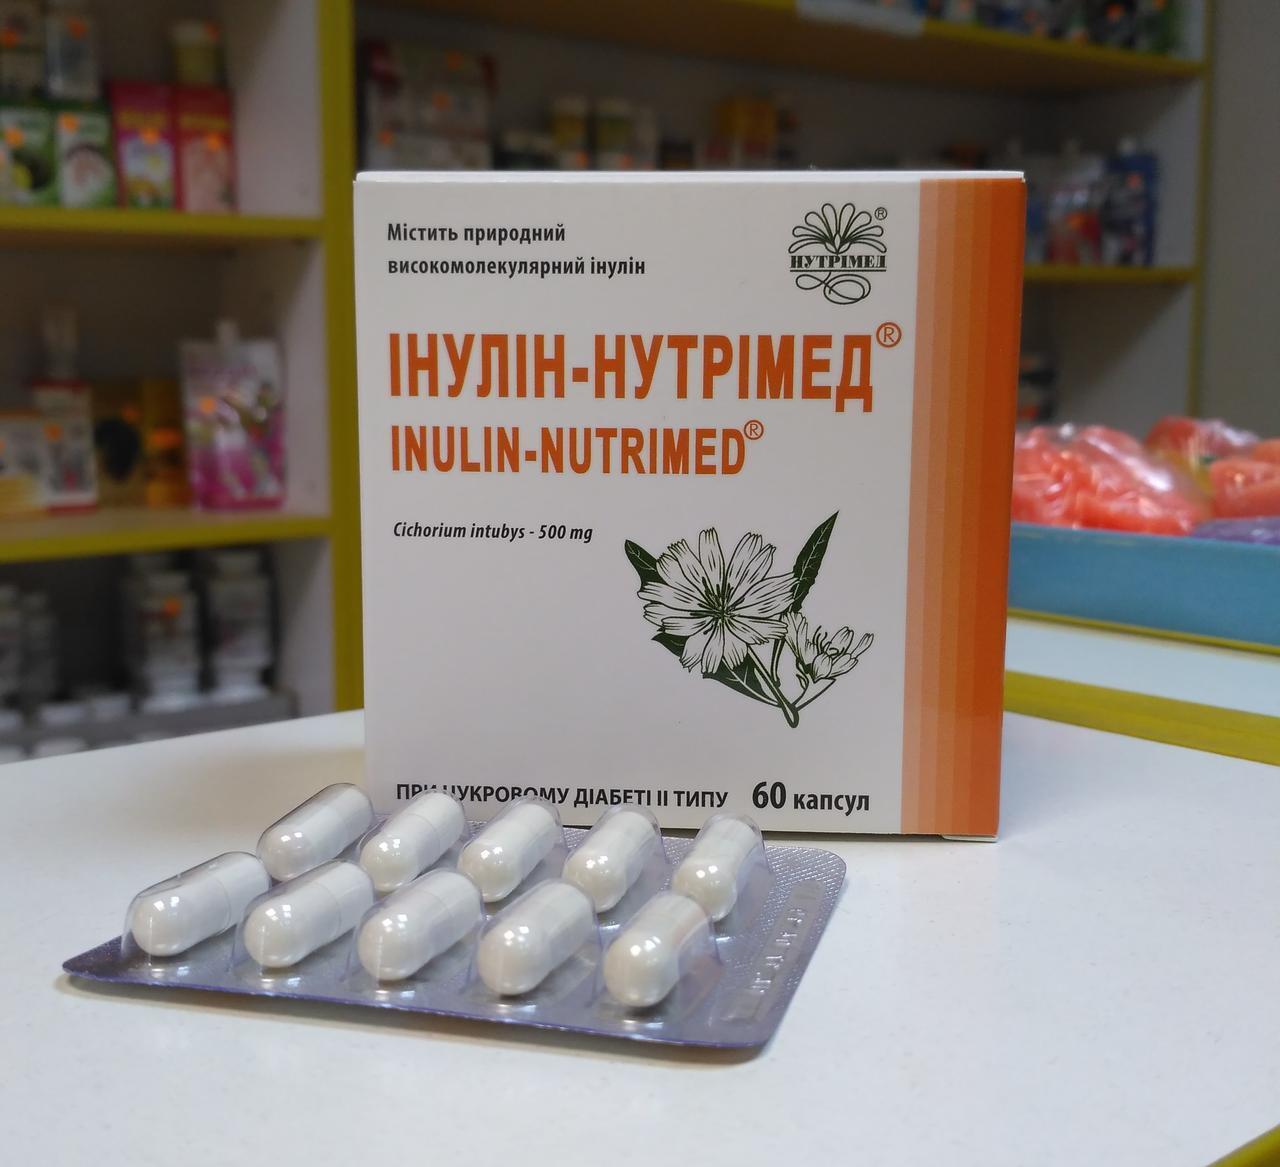 Инулин - нутримед 60 капсул по 500 мг